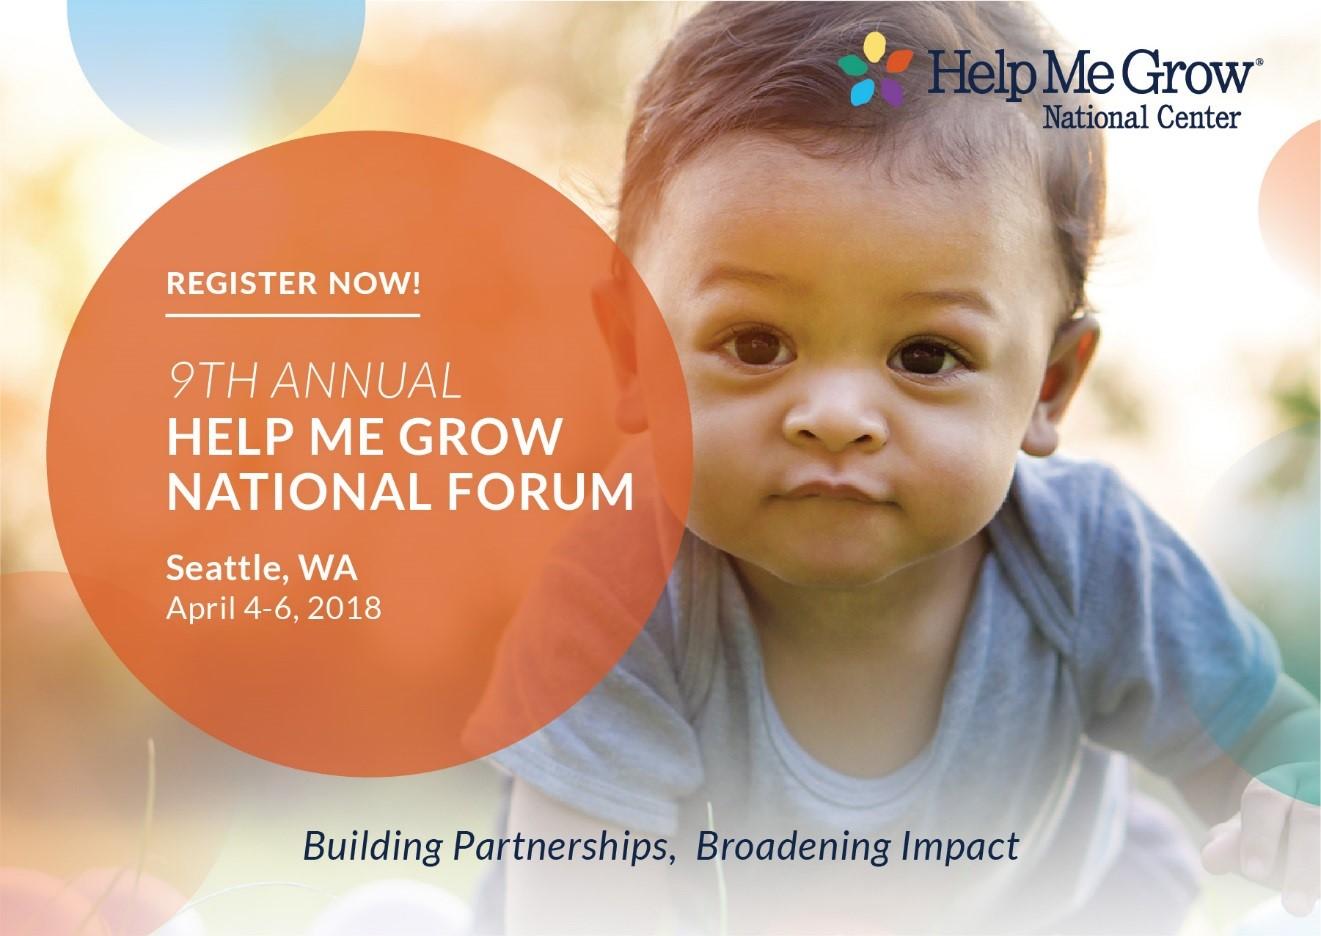 2018 Help Me Grow National Forum